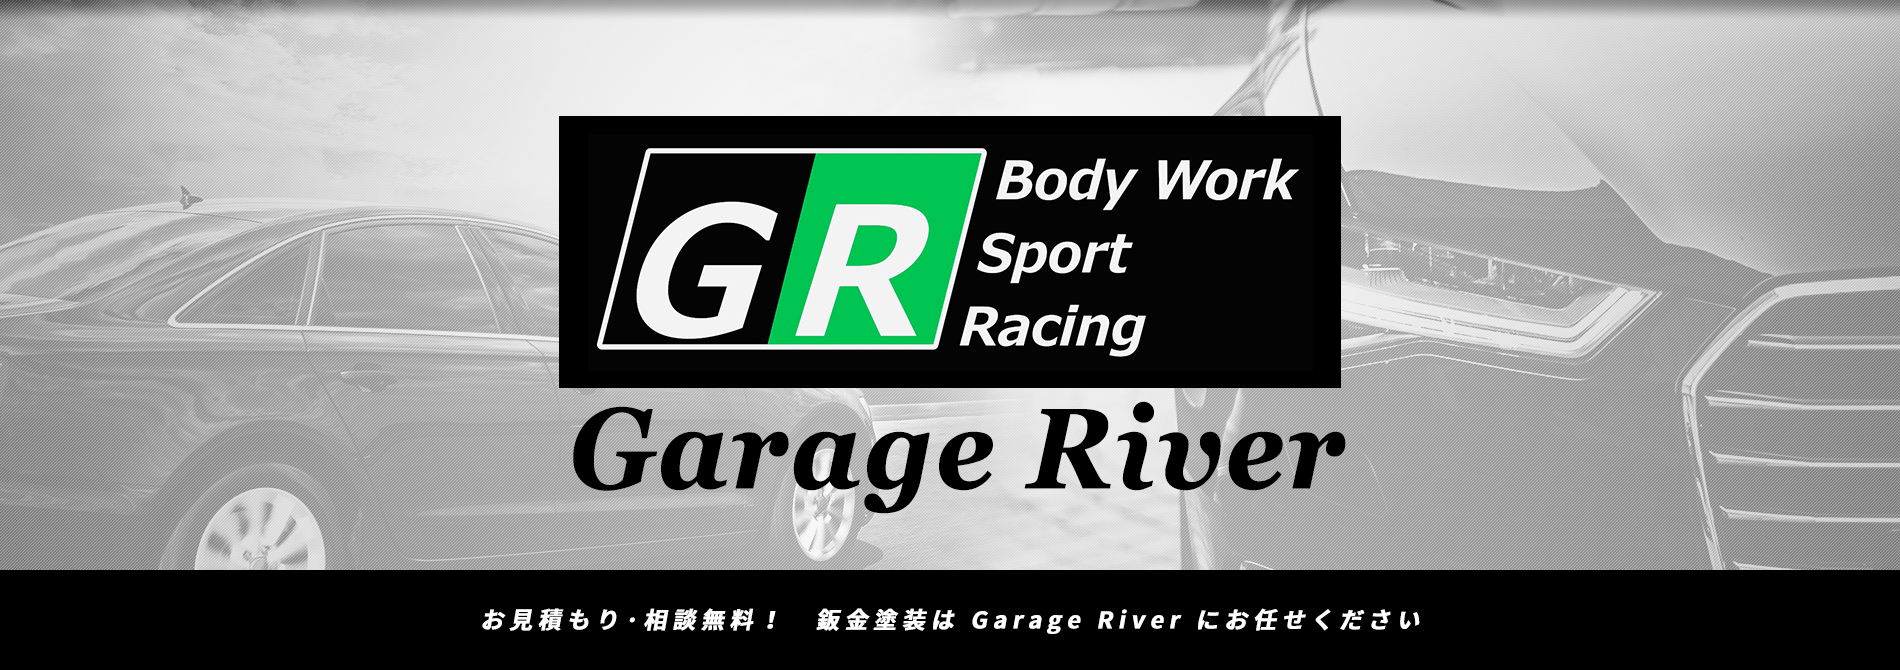 Garage River